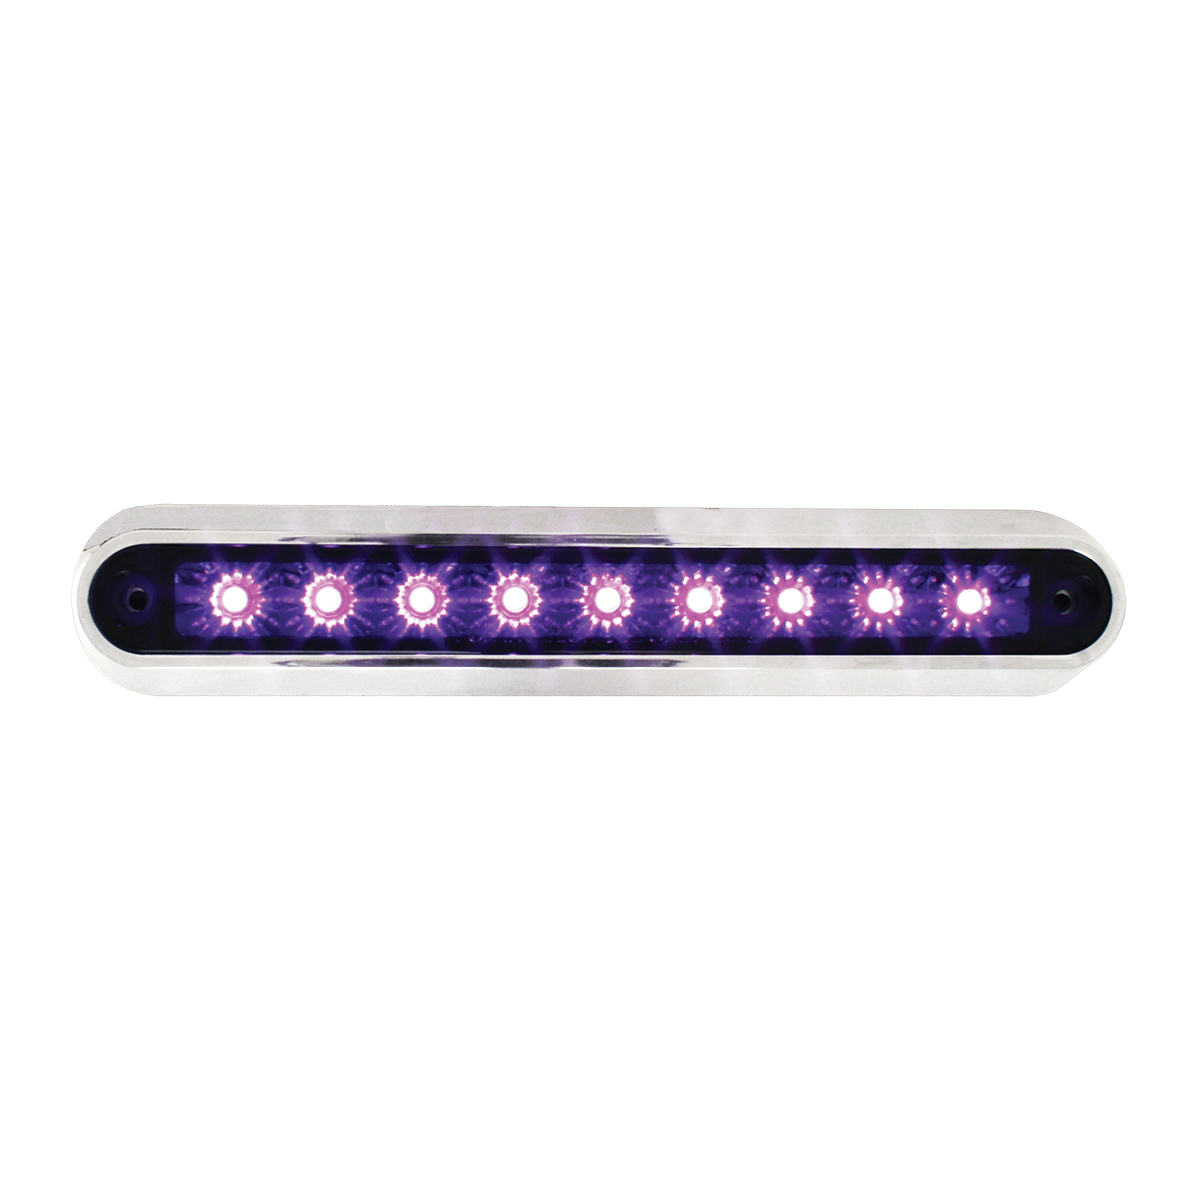 "76097 6.5"" Surface Mount LED Light Bar w/ Chrome Plastic Base"